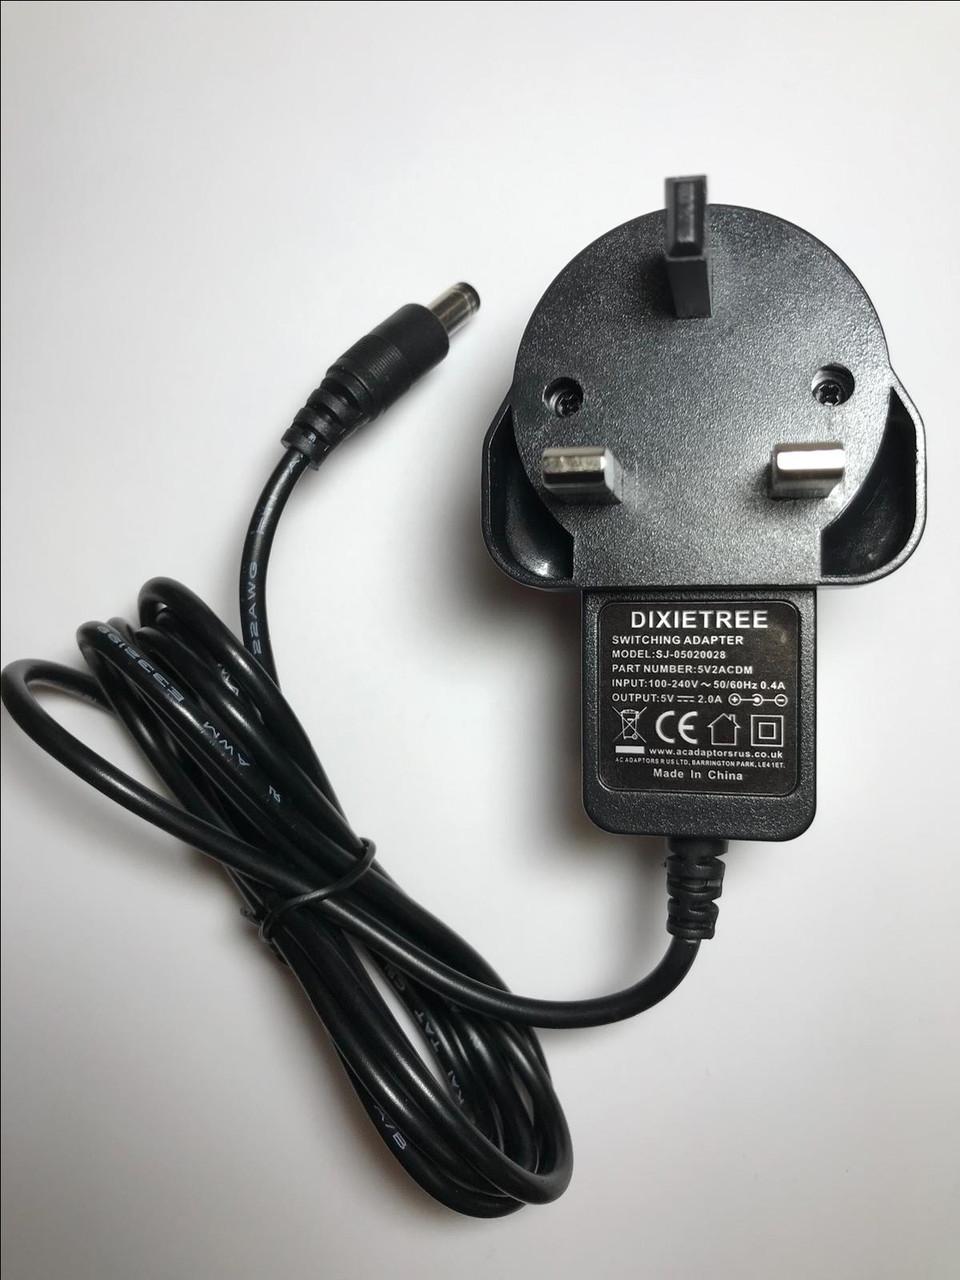 UK Mains AC-DC Switching Adaptor 9V 9 Volt Output 2A 2000mA 4mm x 1.7mm Plug